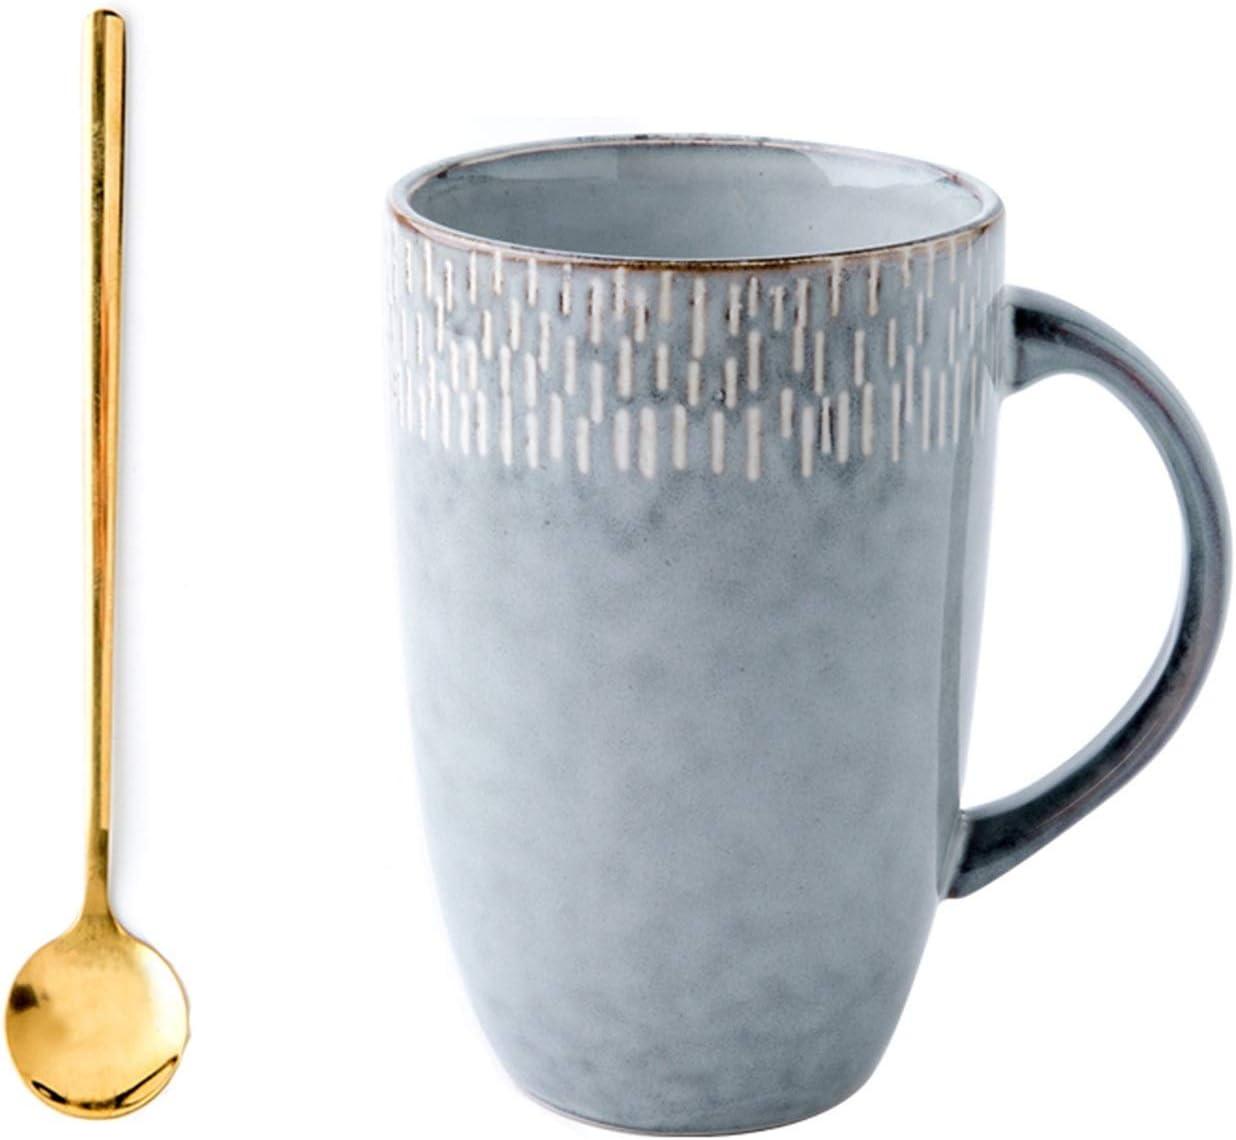 Coffee Cups Retro Feng Shui Ranking TOP19 Cup Tea Same day shipping C 22.0 Mug Oz Large-capacity